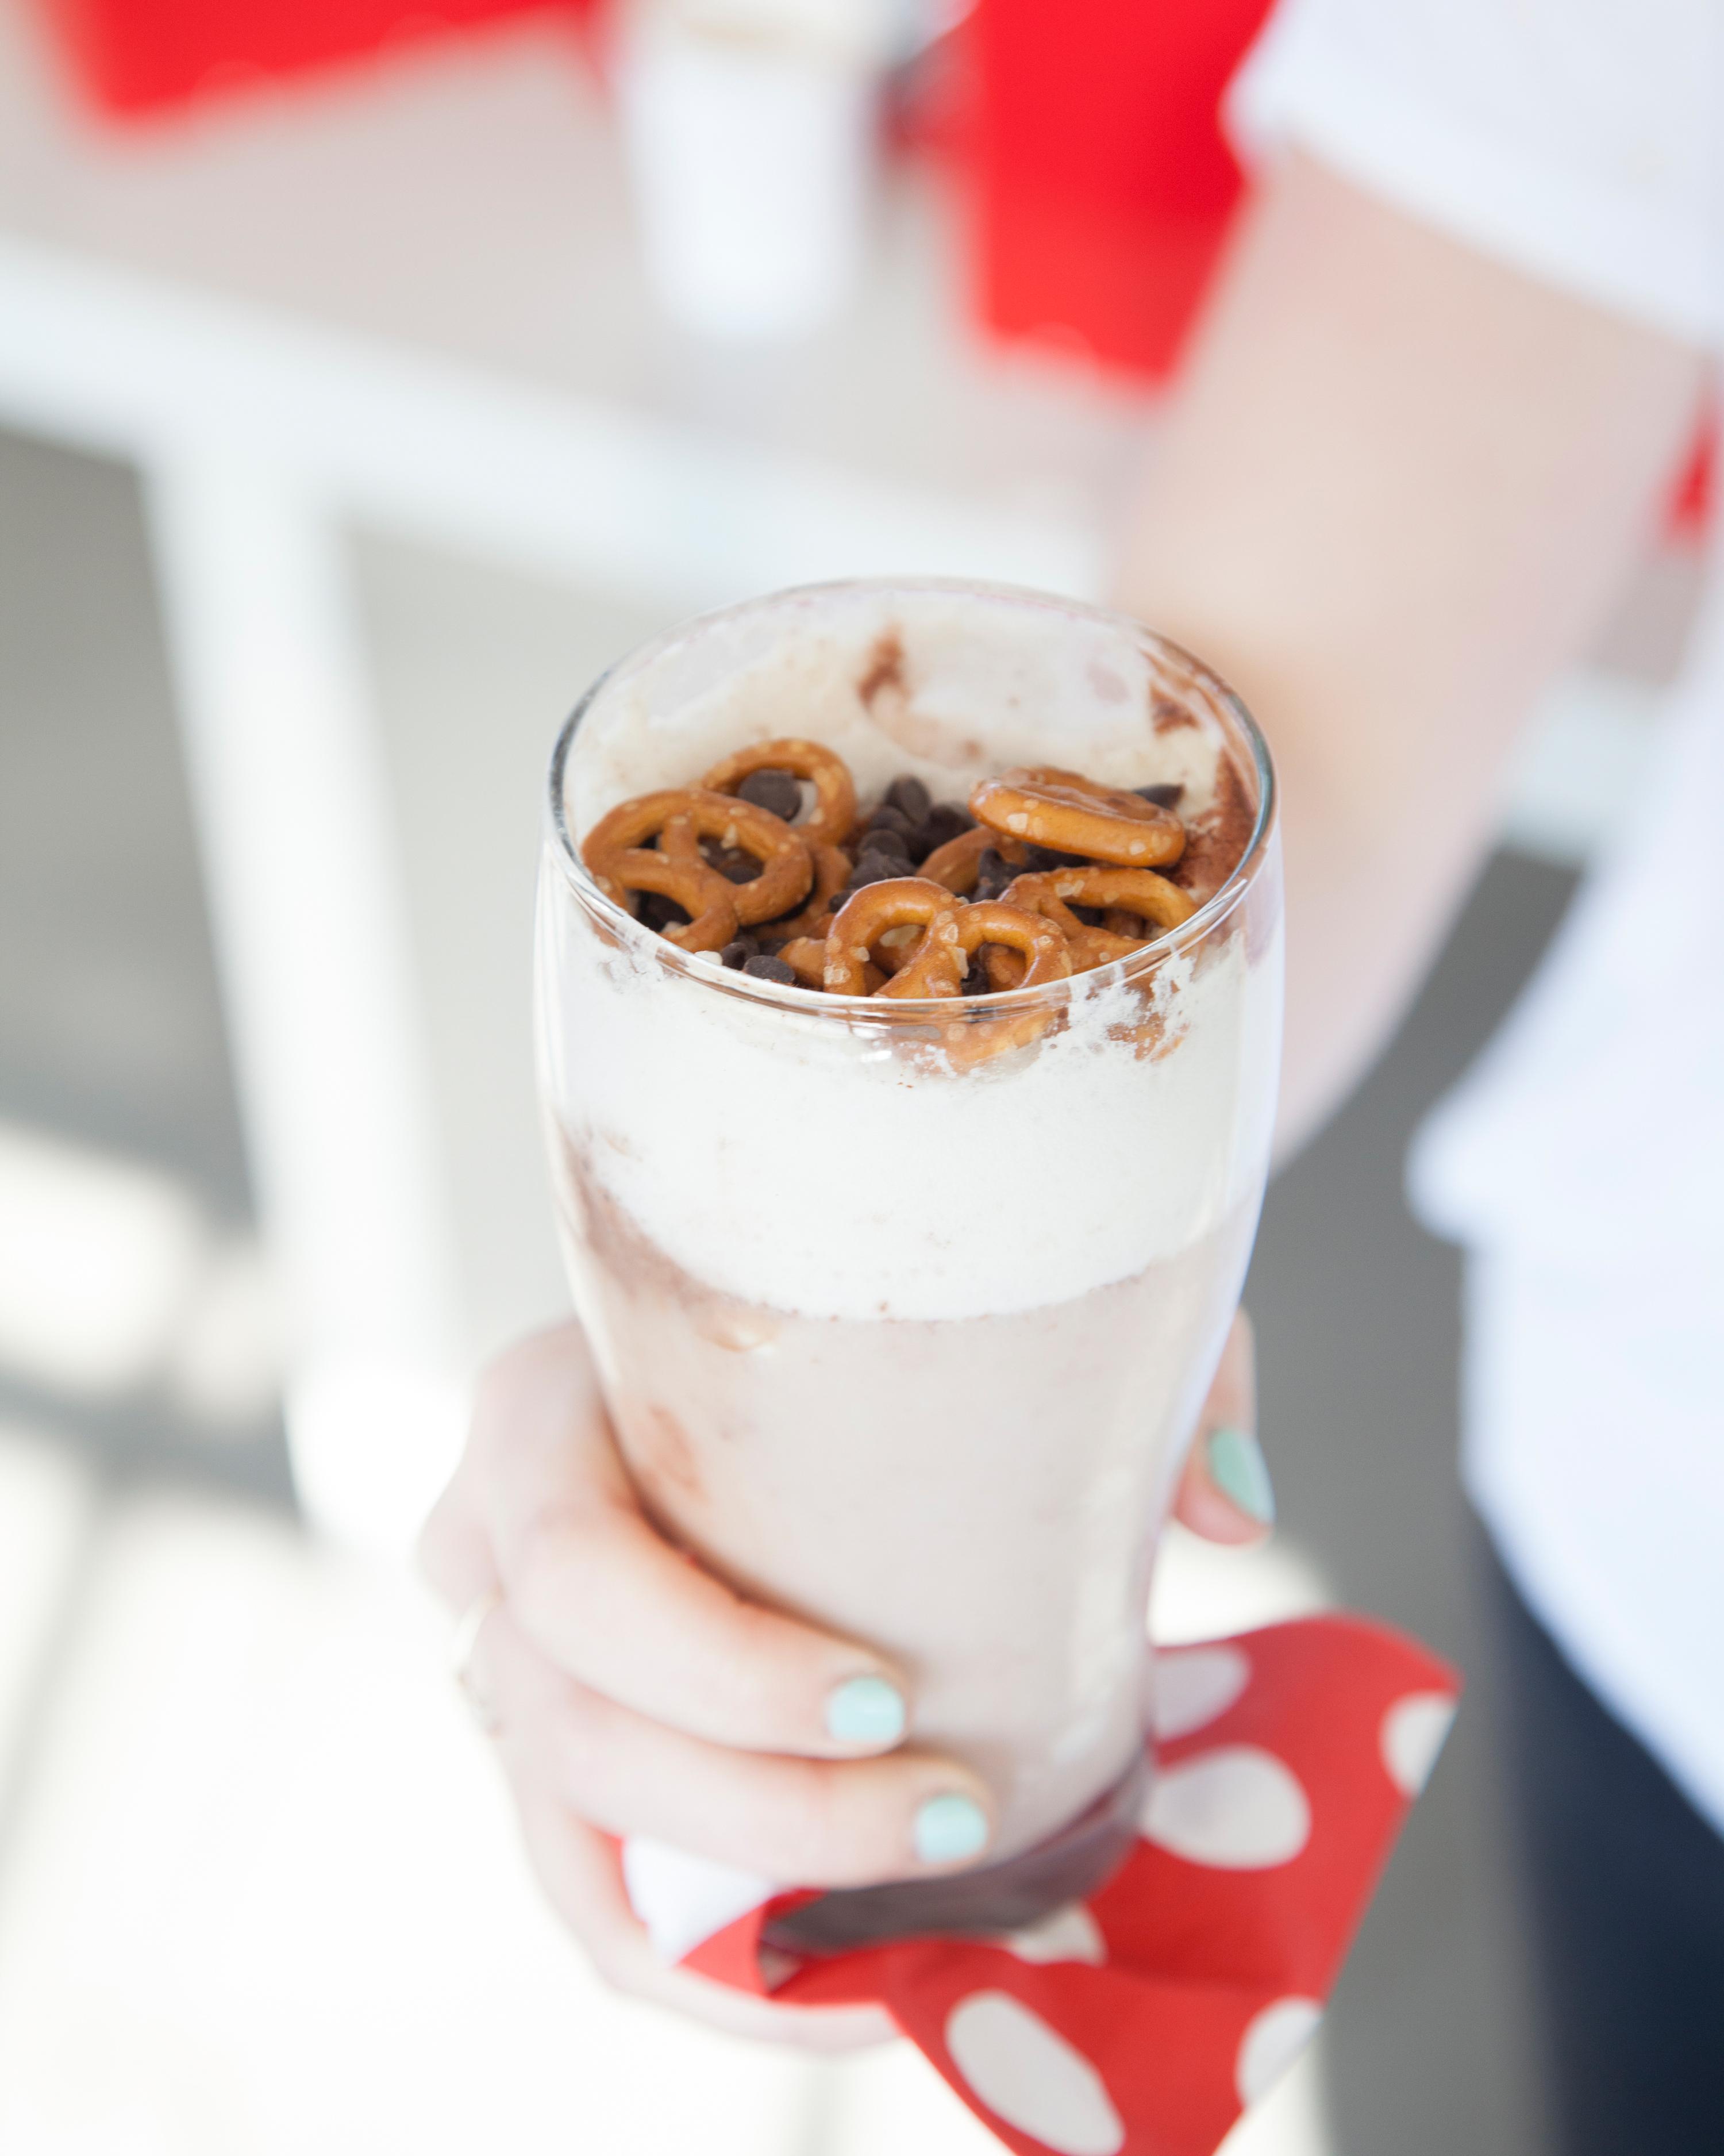 retro-ice-cream-parlor-bridal-shower-jaime-signature-milkshake-with-pretzels-0815.jpg